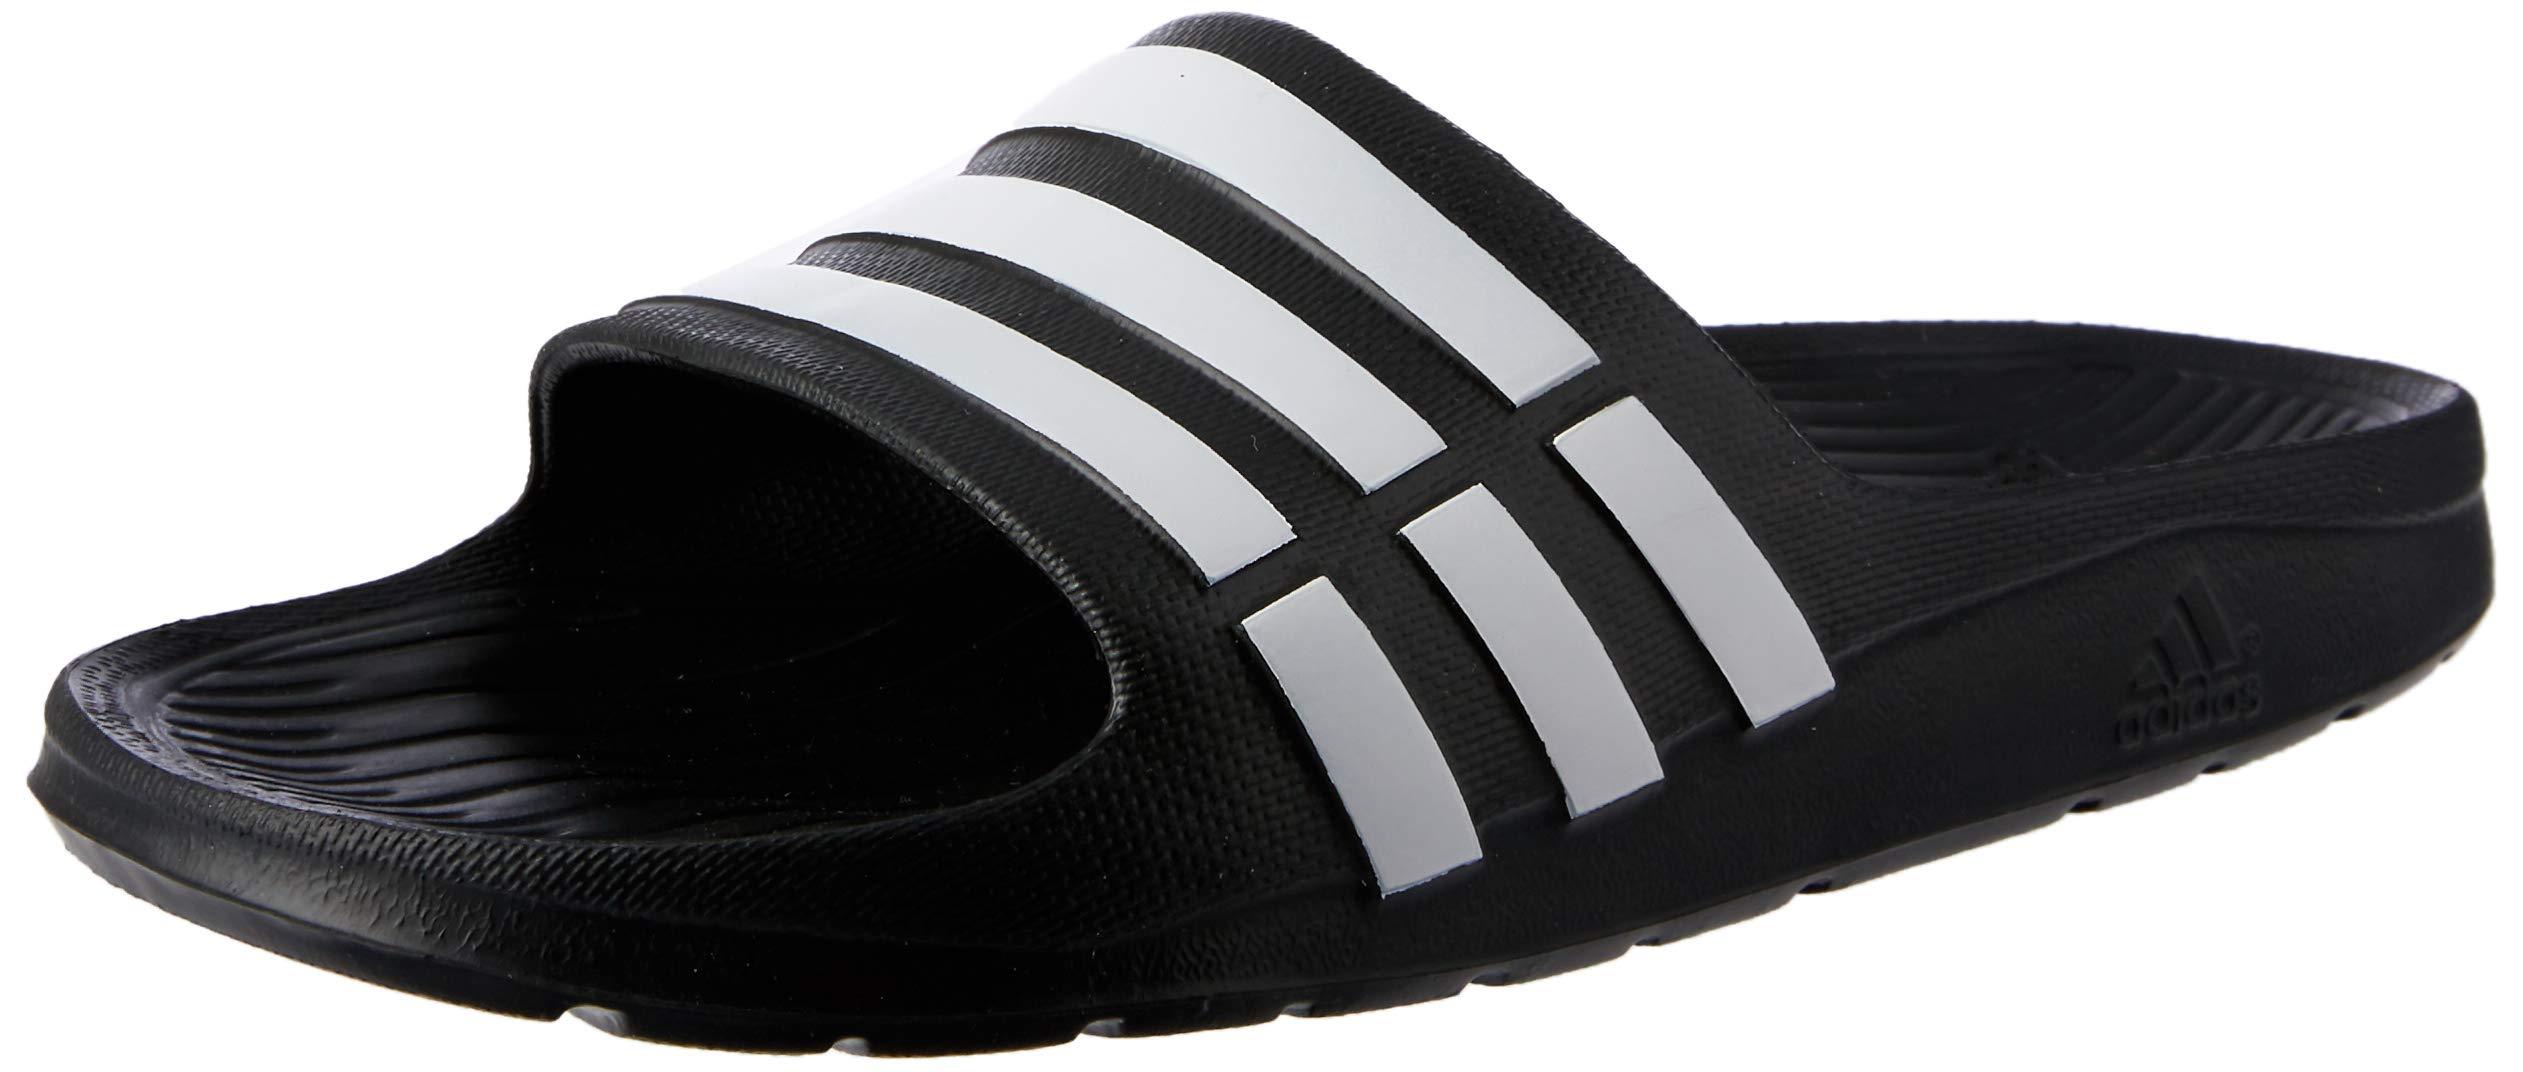 adidas Performance Kids' Duramo Slide Sandal (Toddler/Little Kid/Big Kid),Black/Running White/Black,1 M US Little Kid by adidas